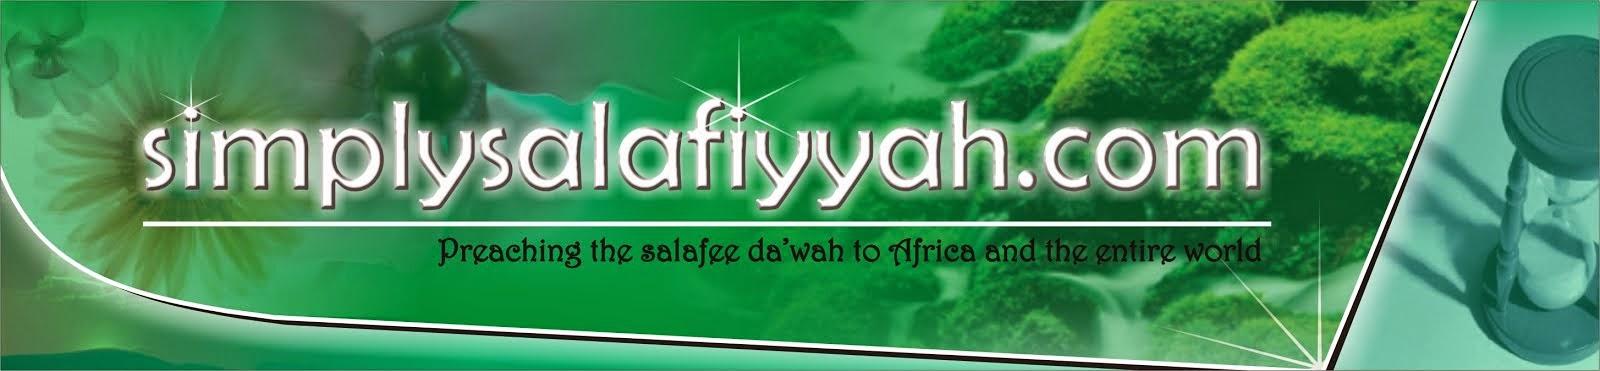 Simplysalafiyyah Blog